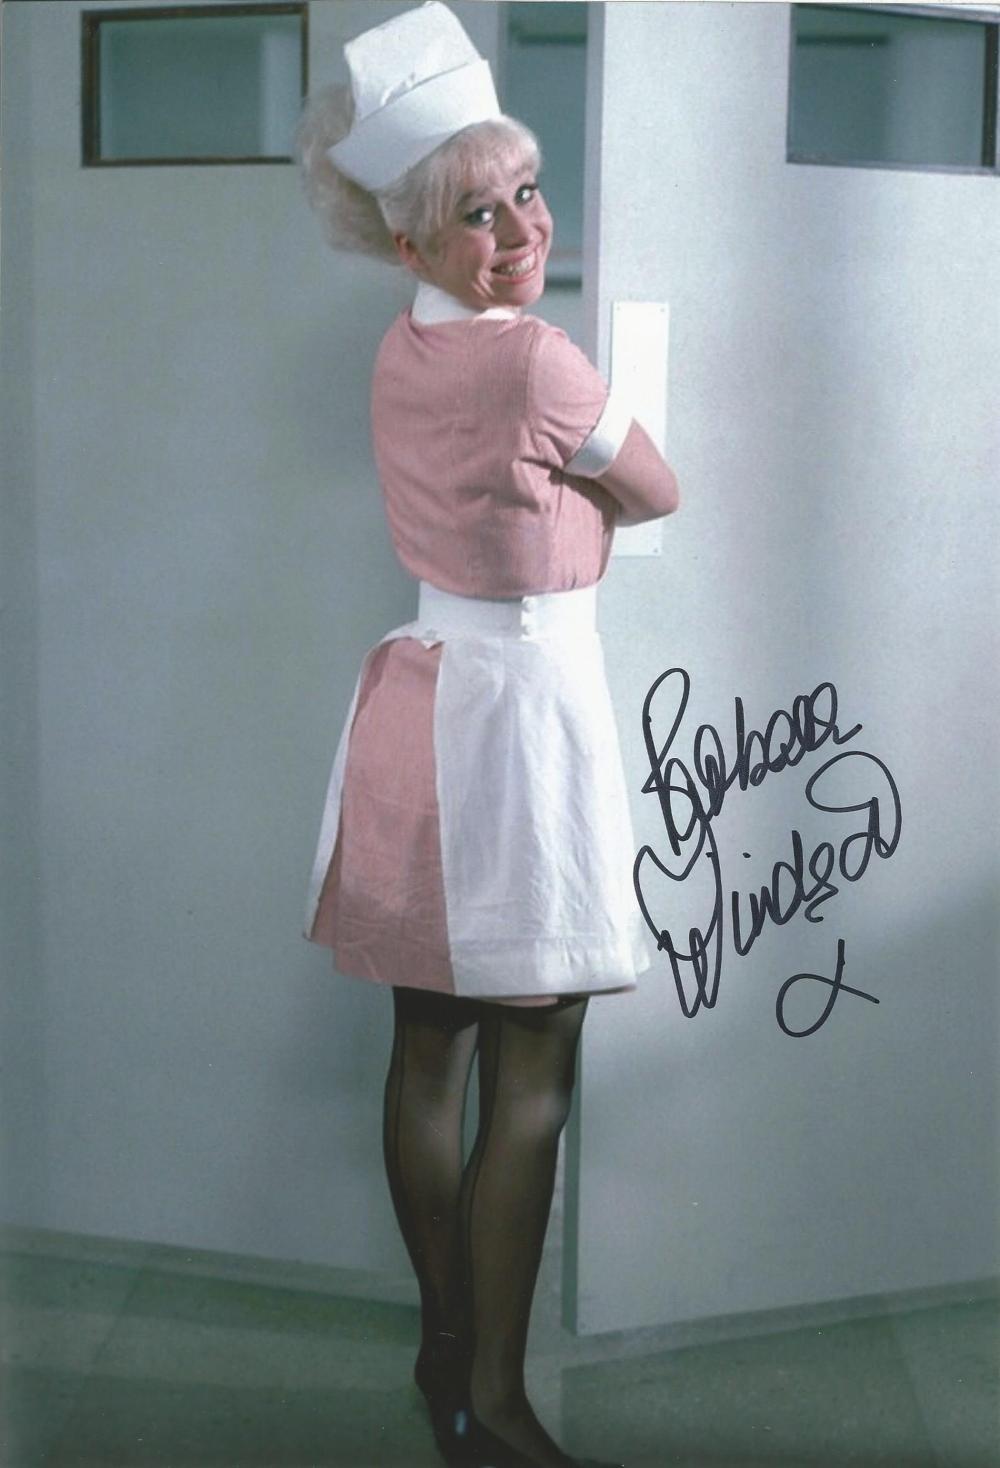 Carry on Nurse Barbara Windsor signed 12 x 8 inch colour photo in Nurse uniform. Good condition